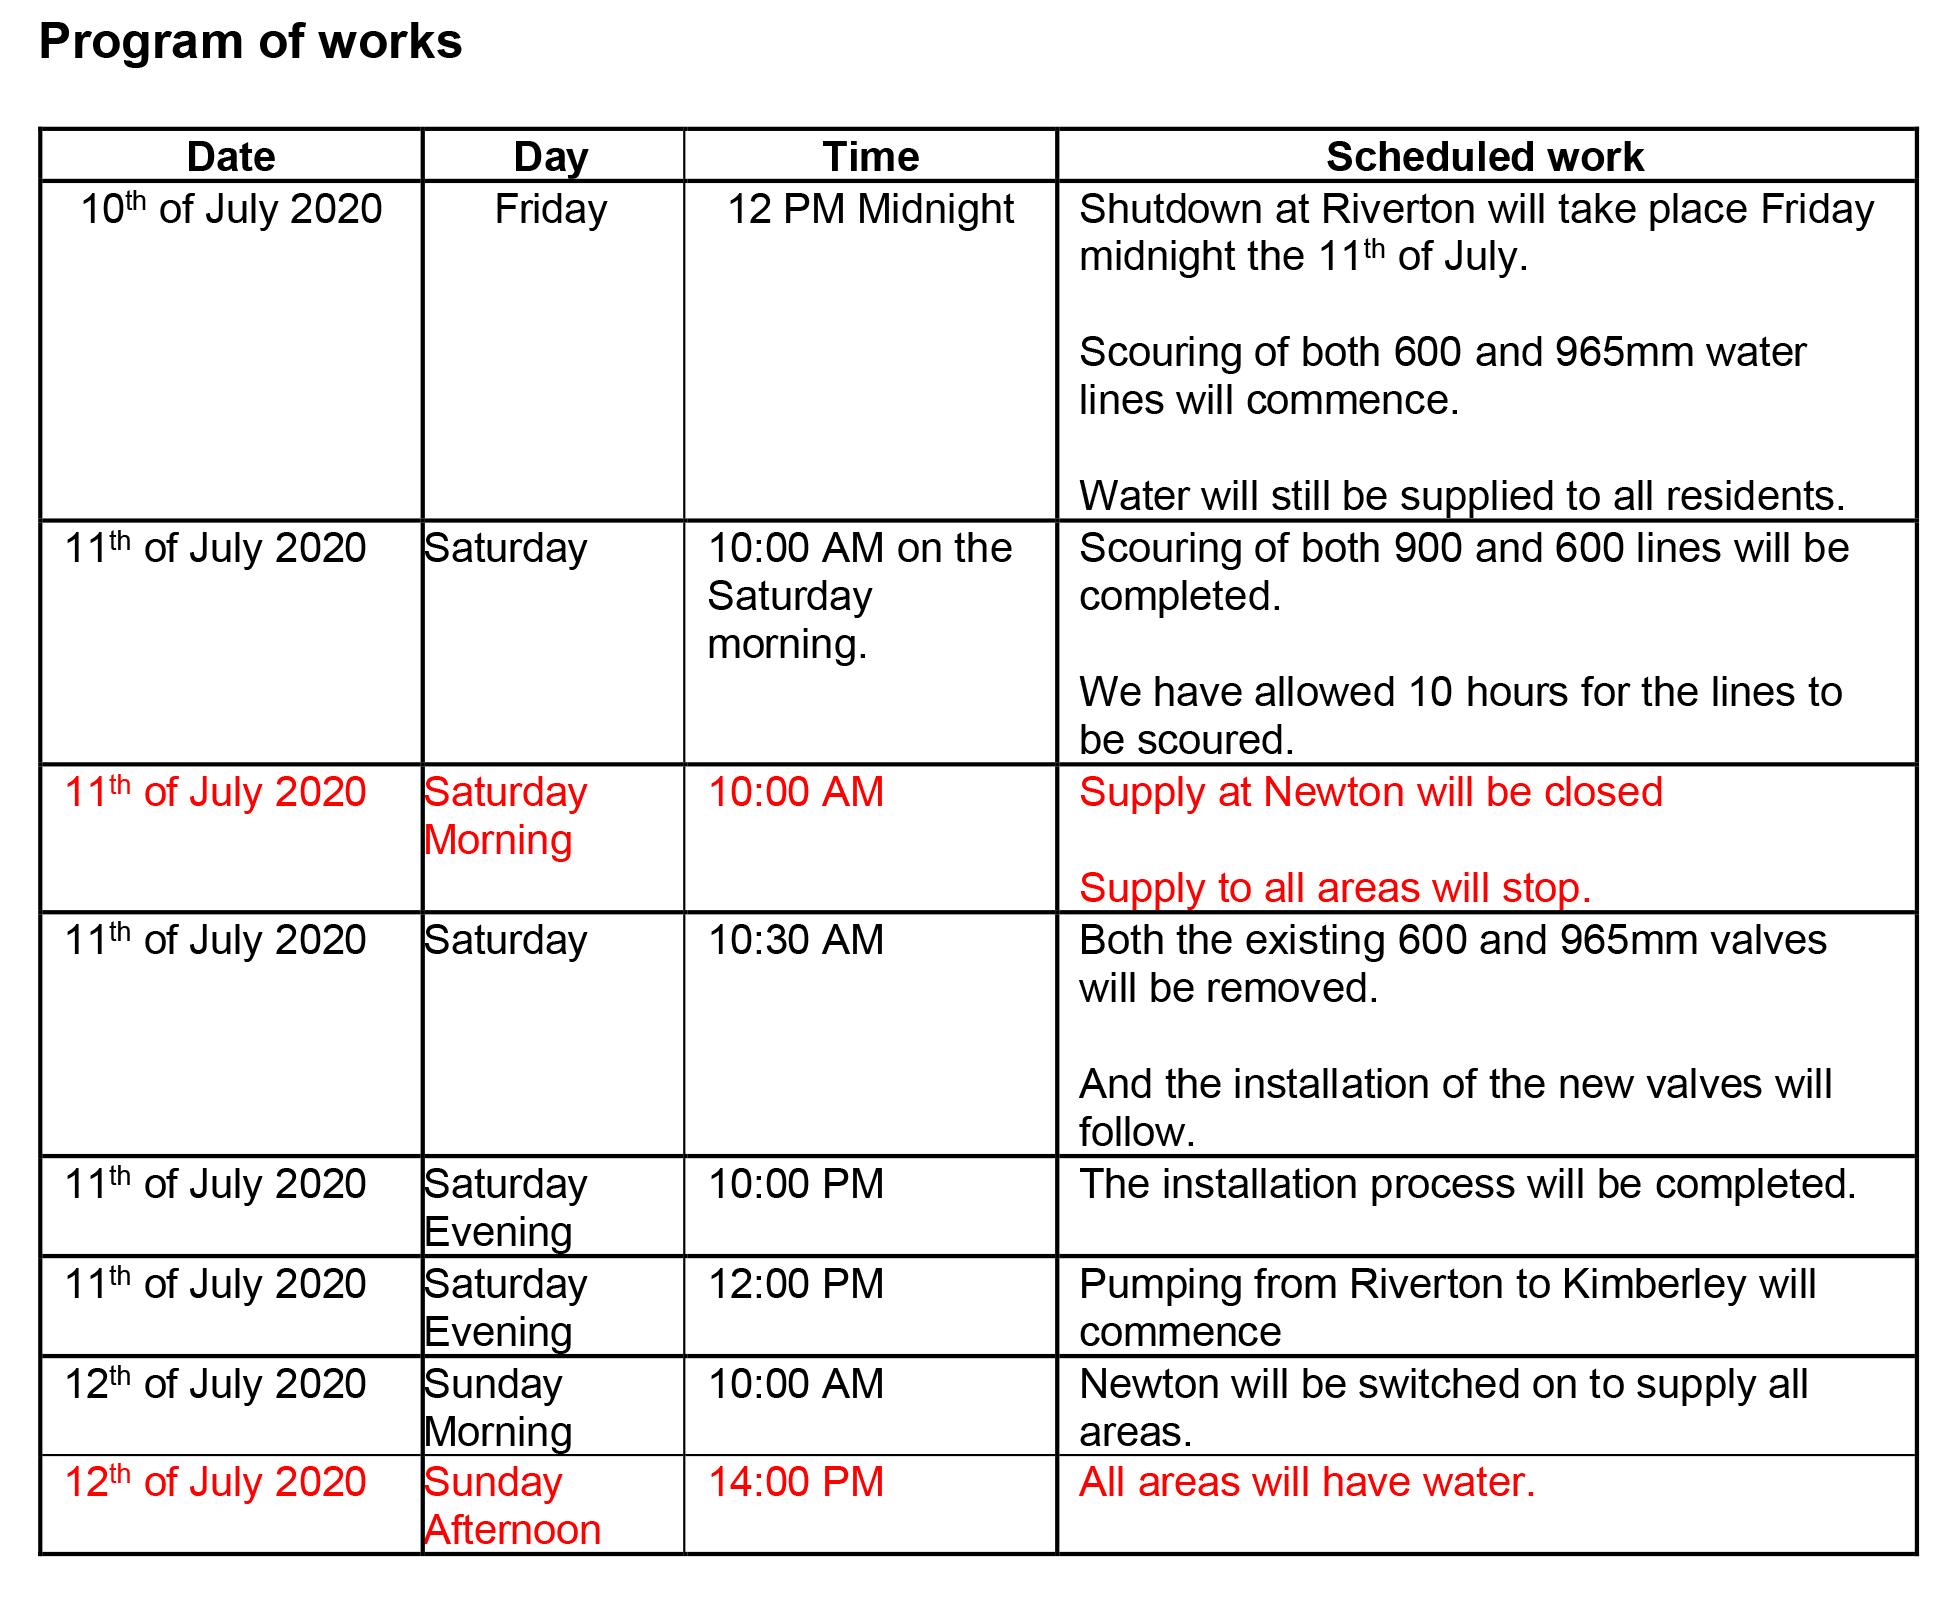 Kimberley-Sol_Plaatje_Municipality-Water_Interruption-PT-FI-20200711-MEMORANDUM-2